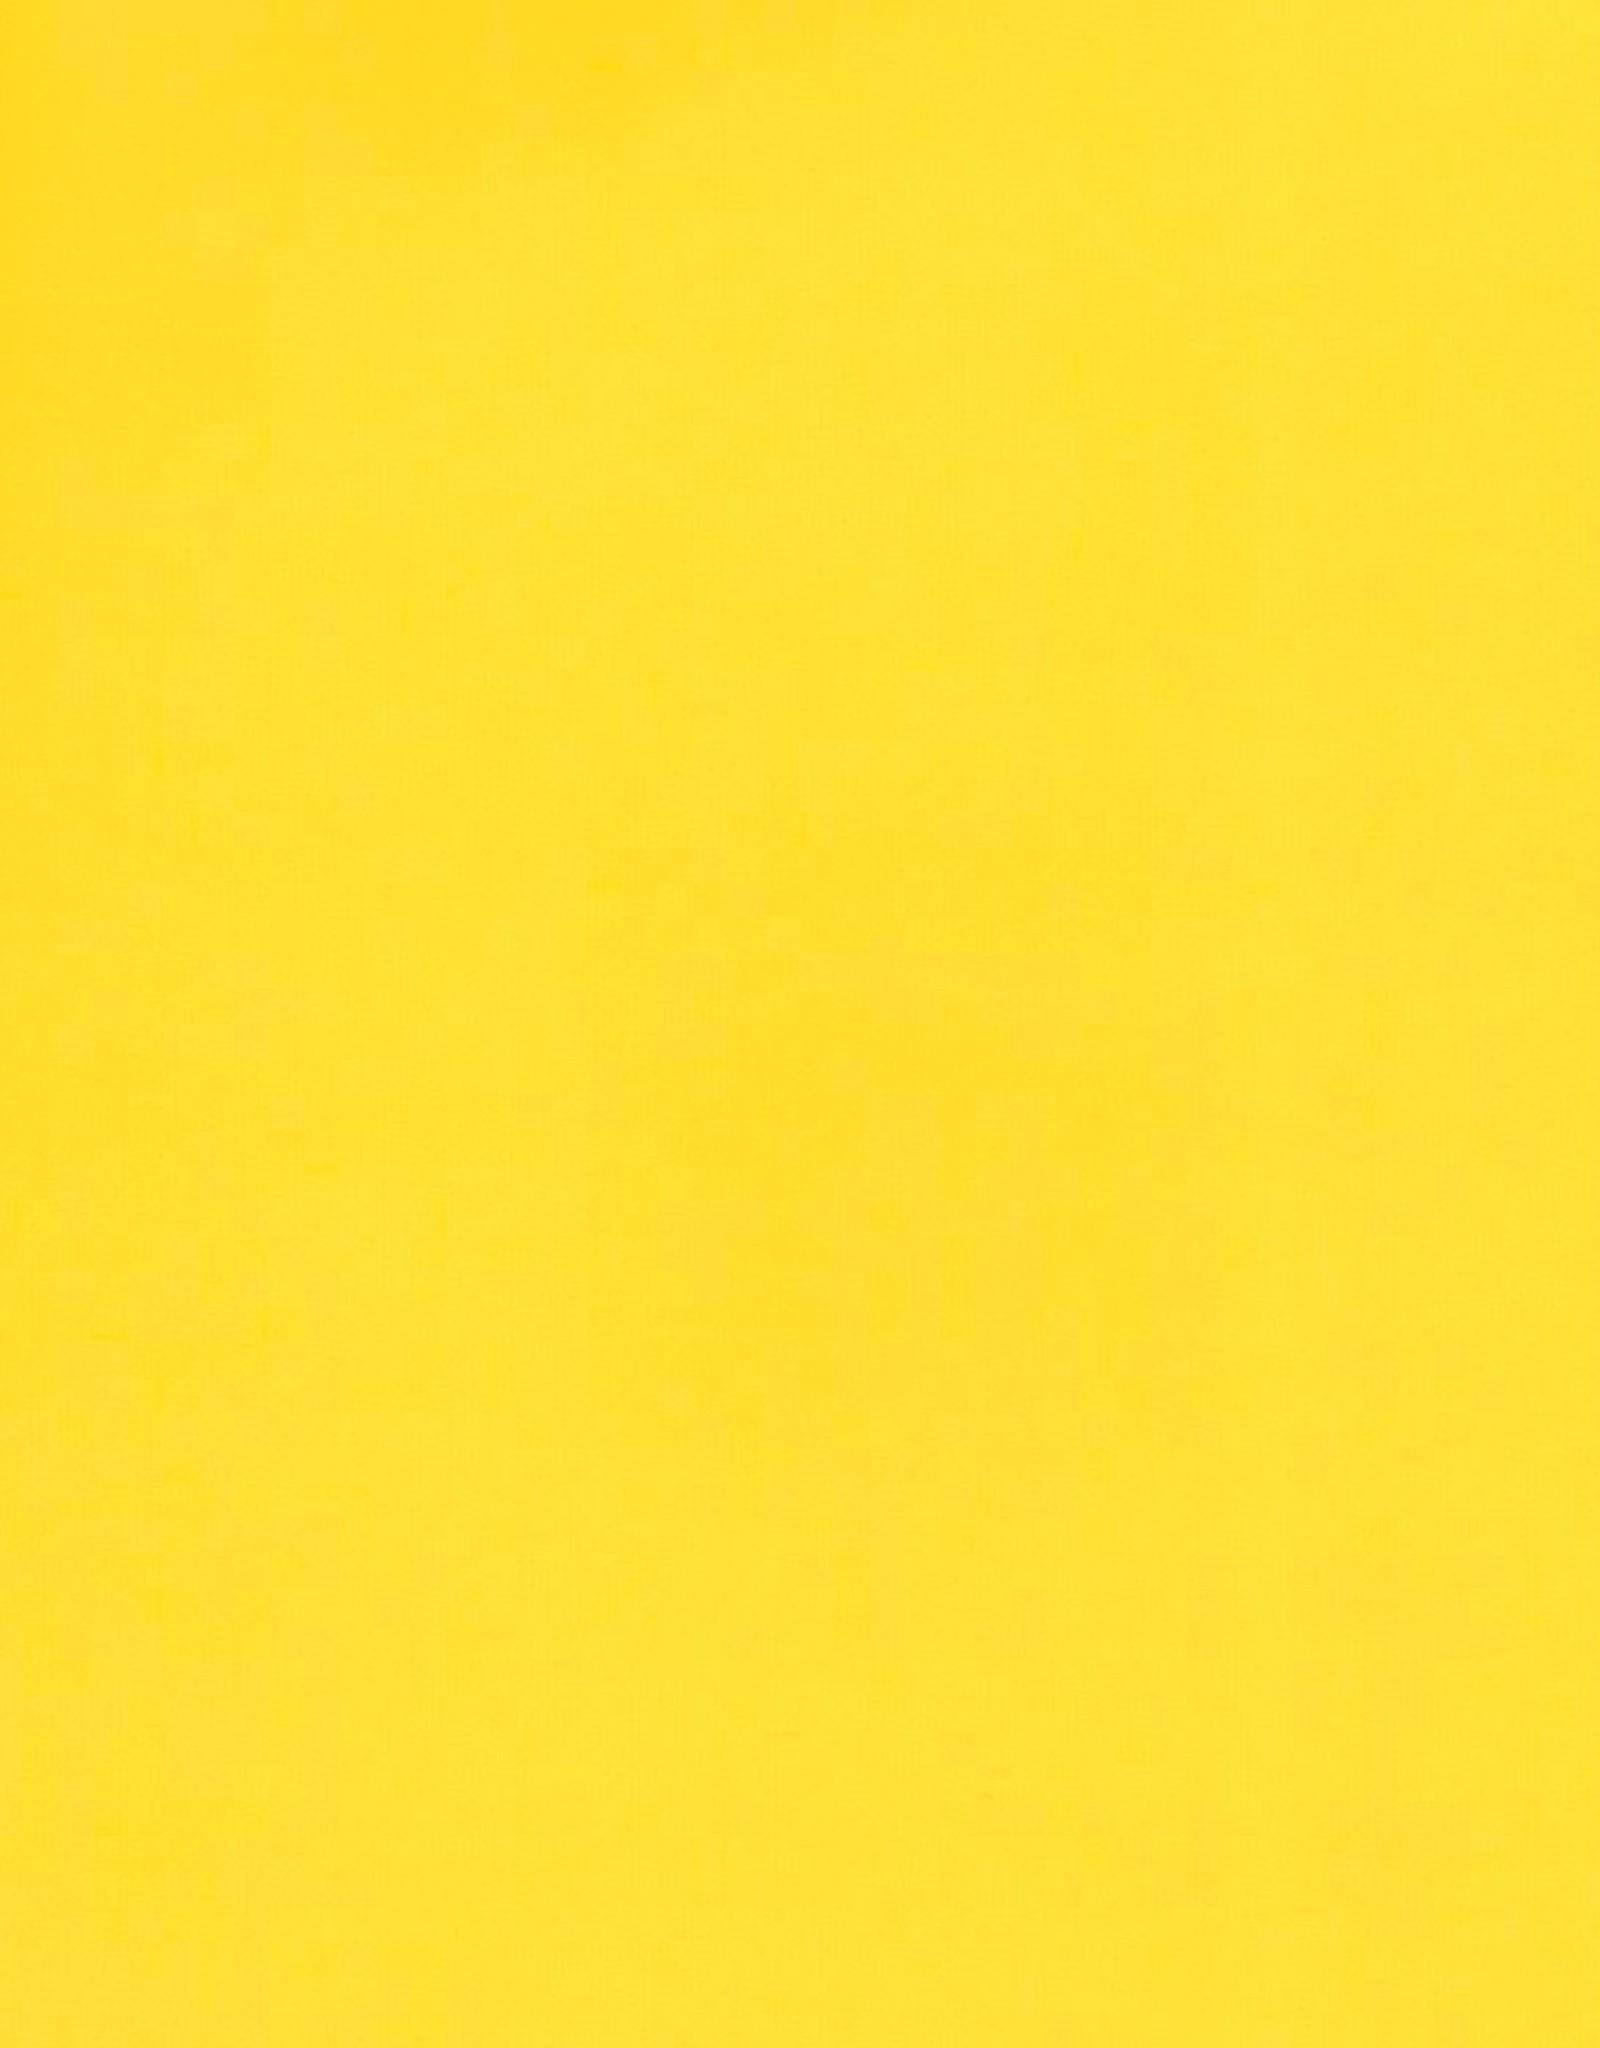 "Fabriano Vice Versa (Elle Erre), Yellow, 20"" x 27.5"", 220gsm / 135#"